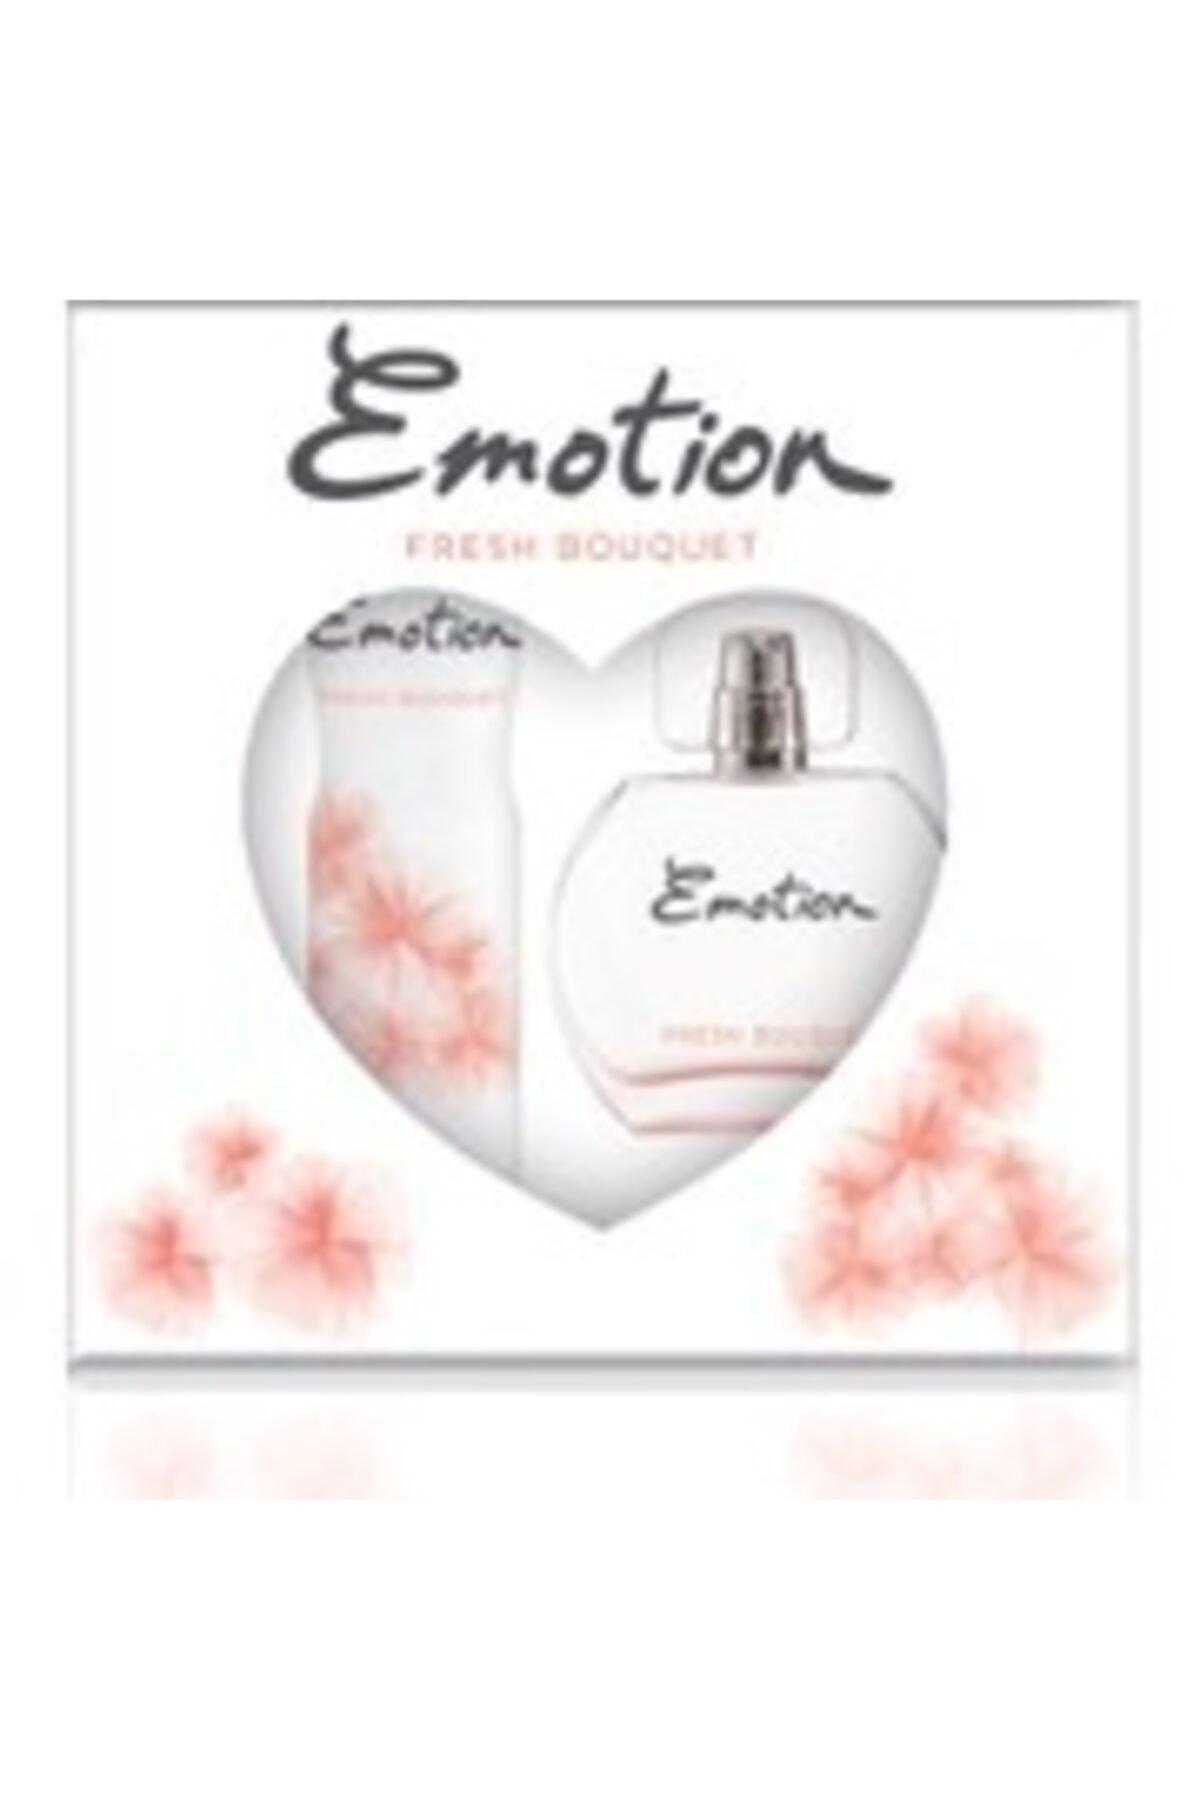 Emotion Fresh Bouqlet Bayan Edt 50 Ml + 150 Ml Deodorant Parfüm Seti 2